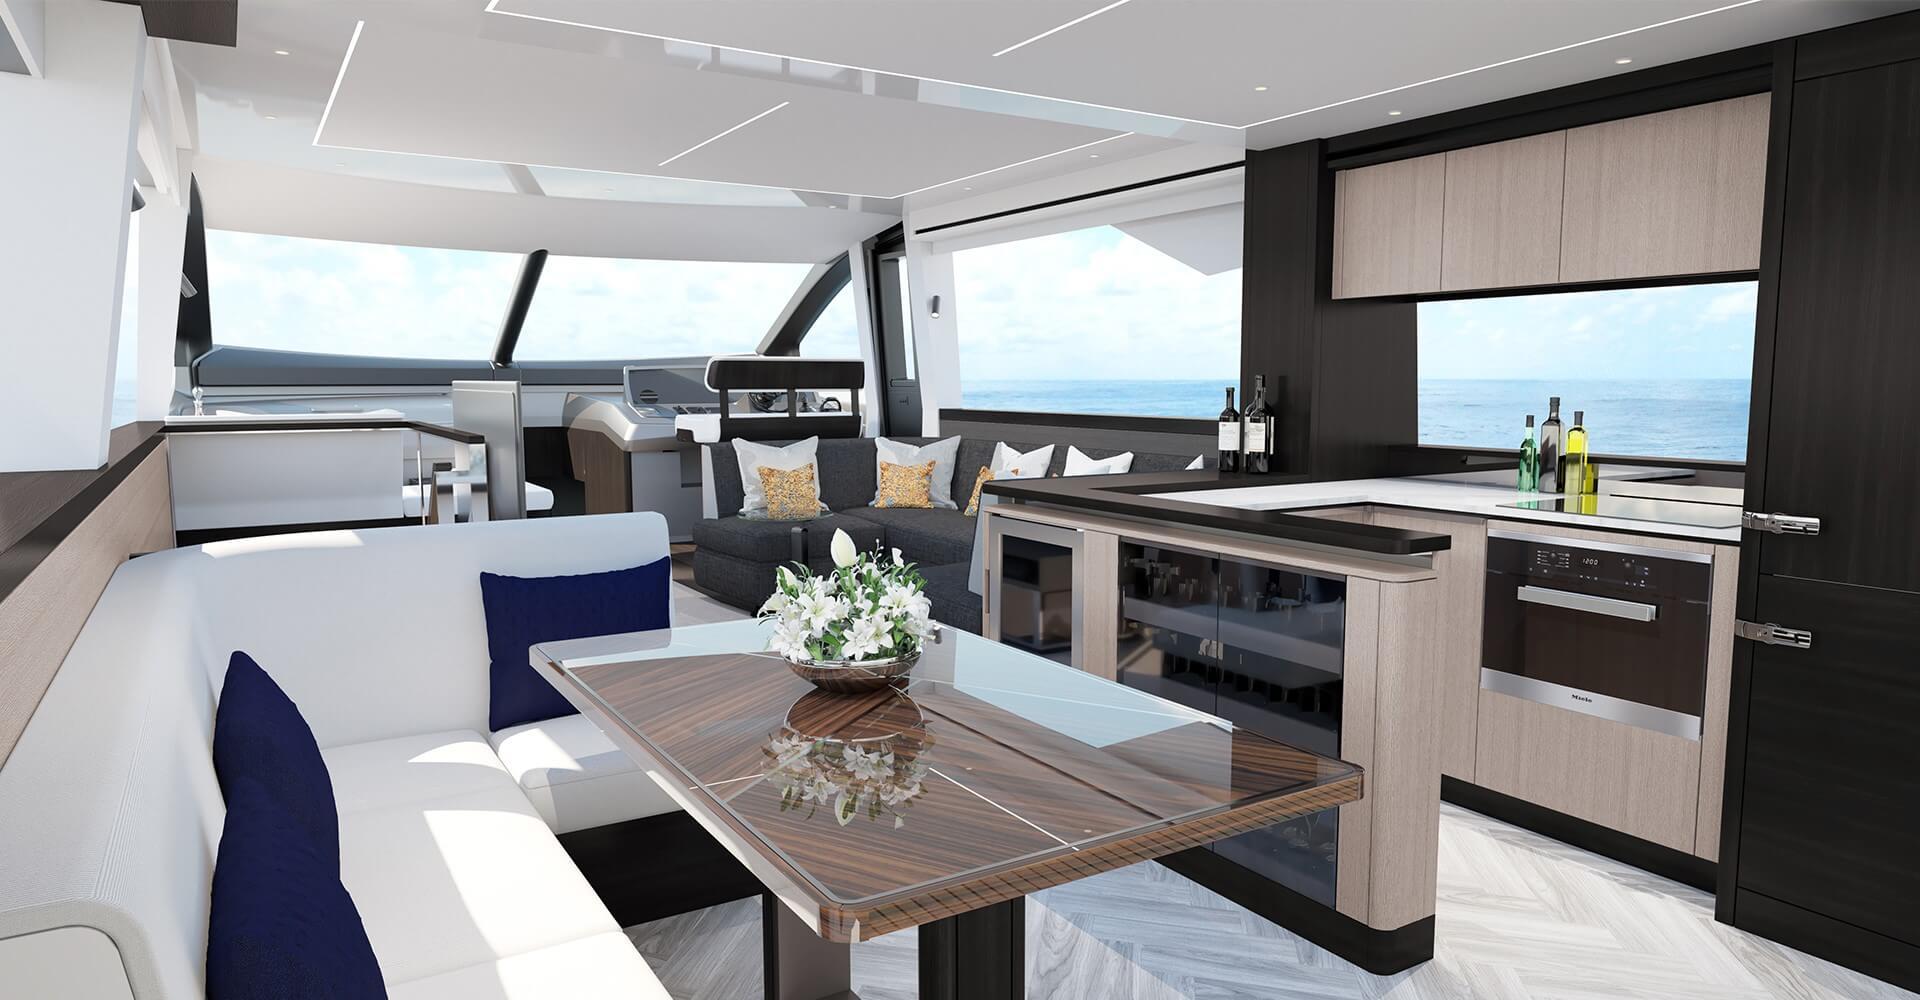 Open plan living aboard the 68ft motor yacht